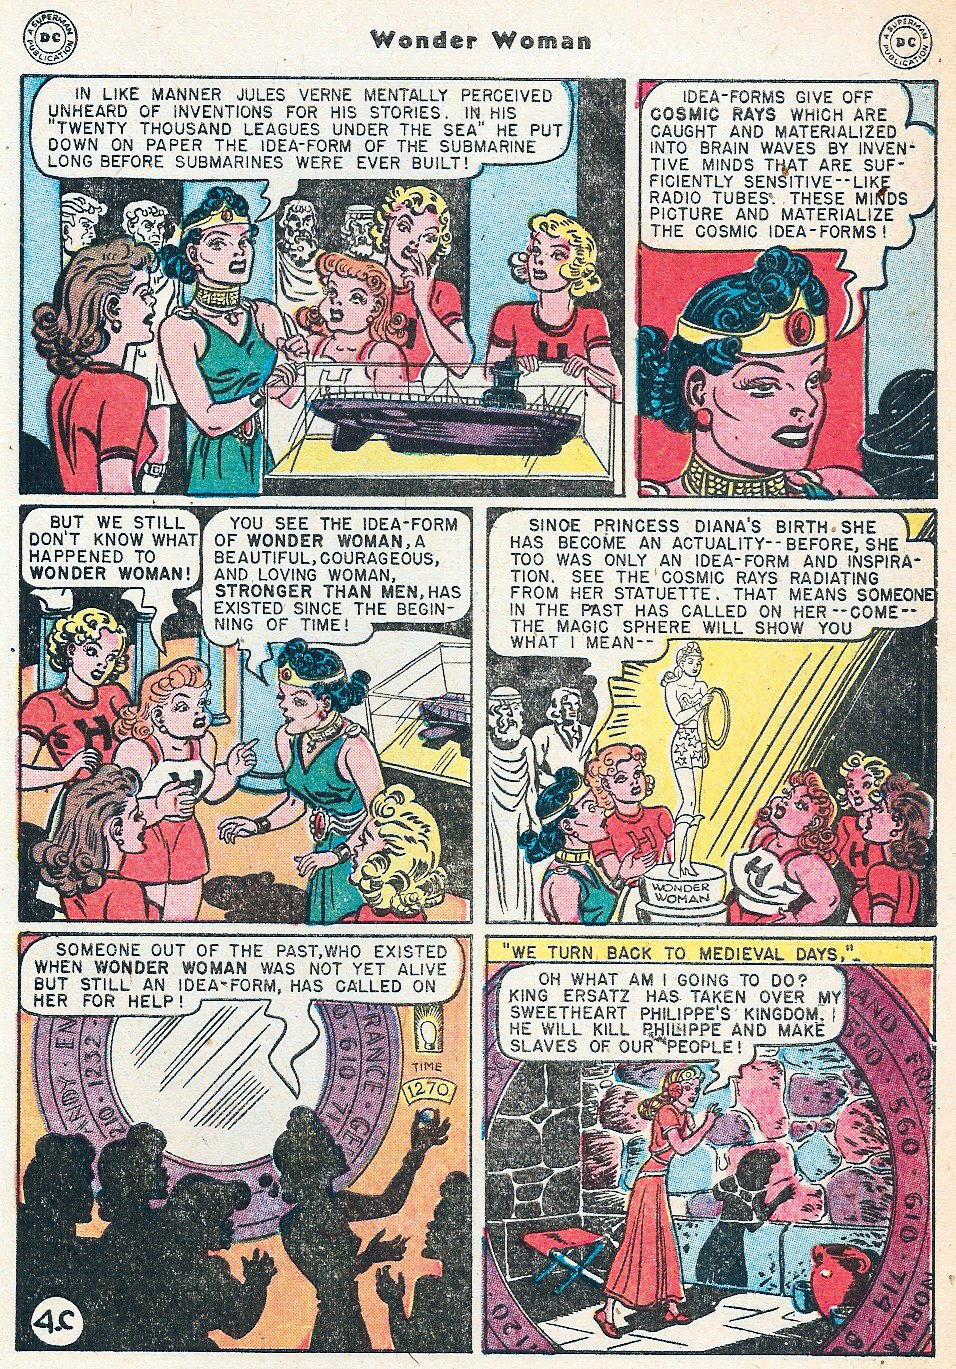 Read online Wonder Woman (1942) comic -  Issue #27 - 41